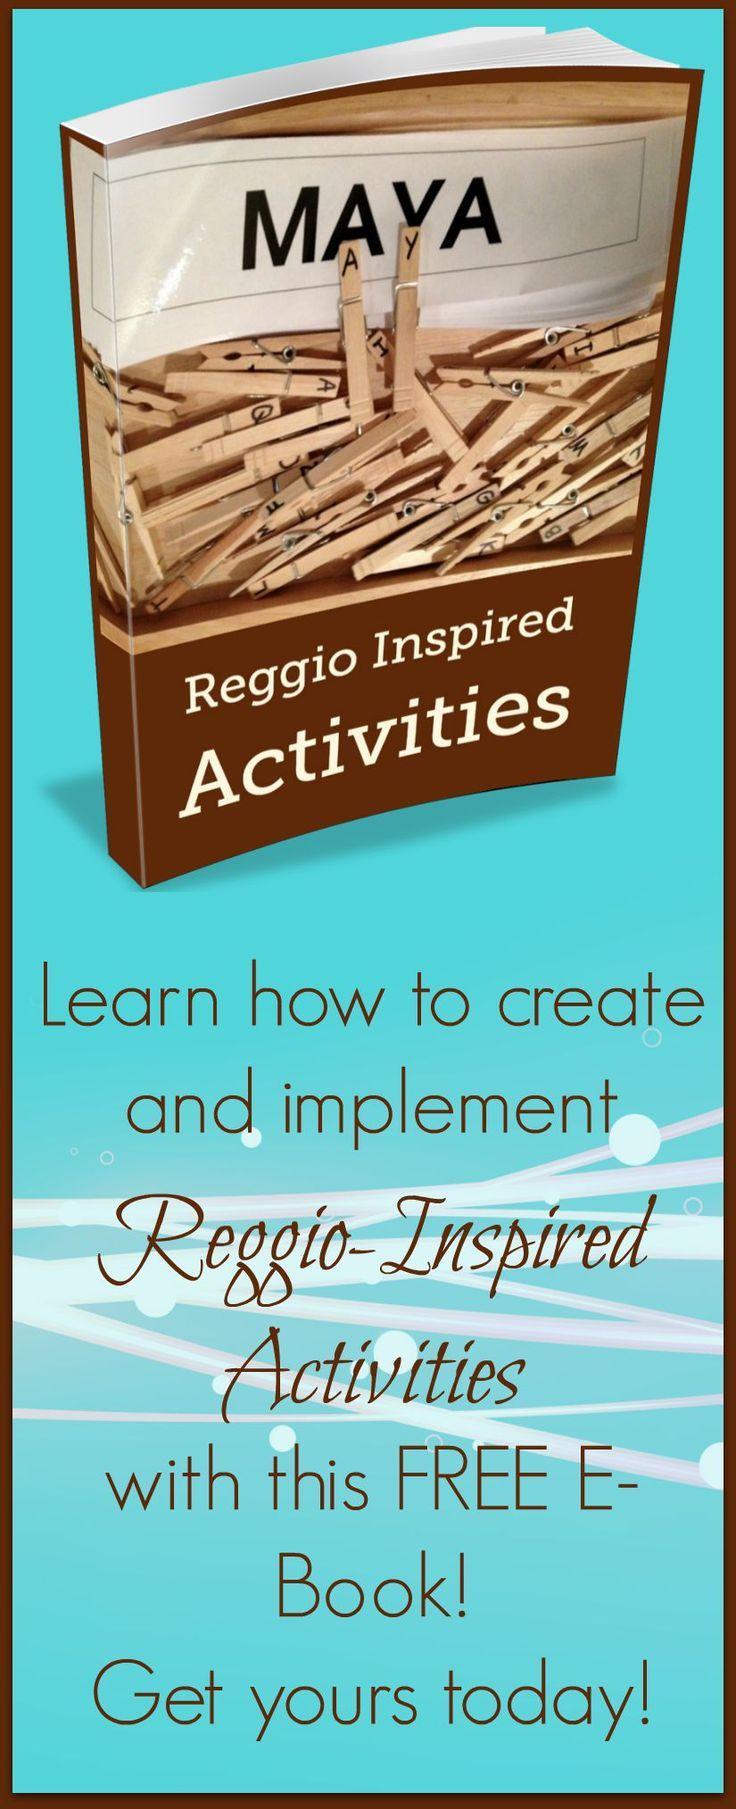 FREE E-Book full of Reggio-Inspired activities!